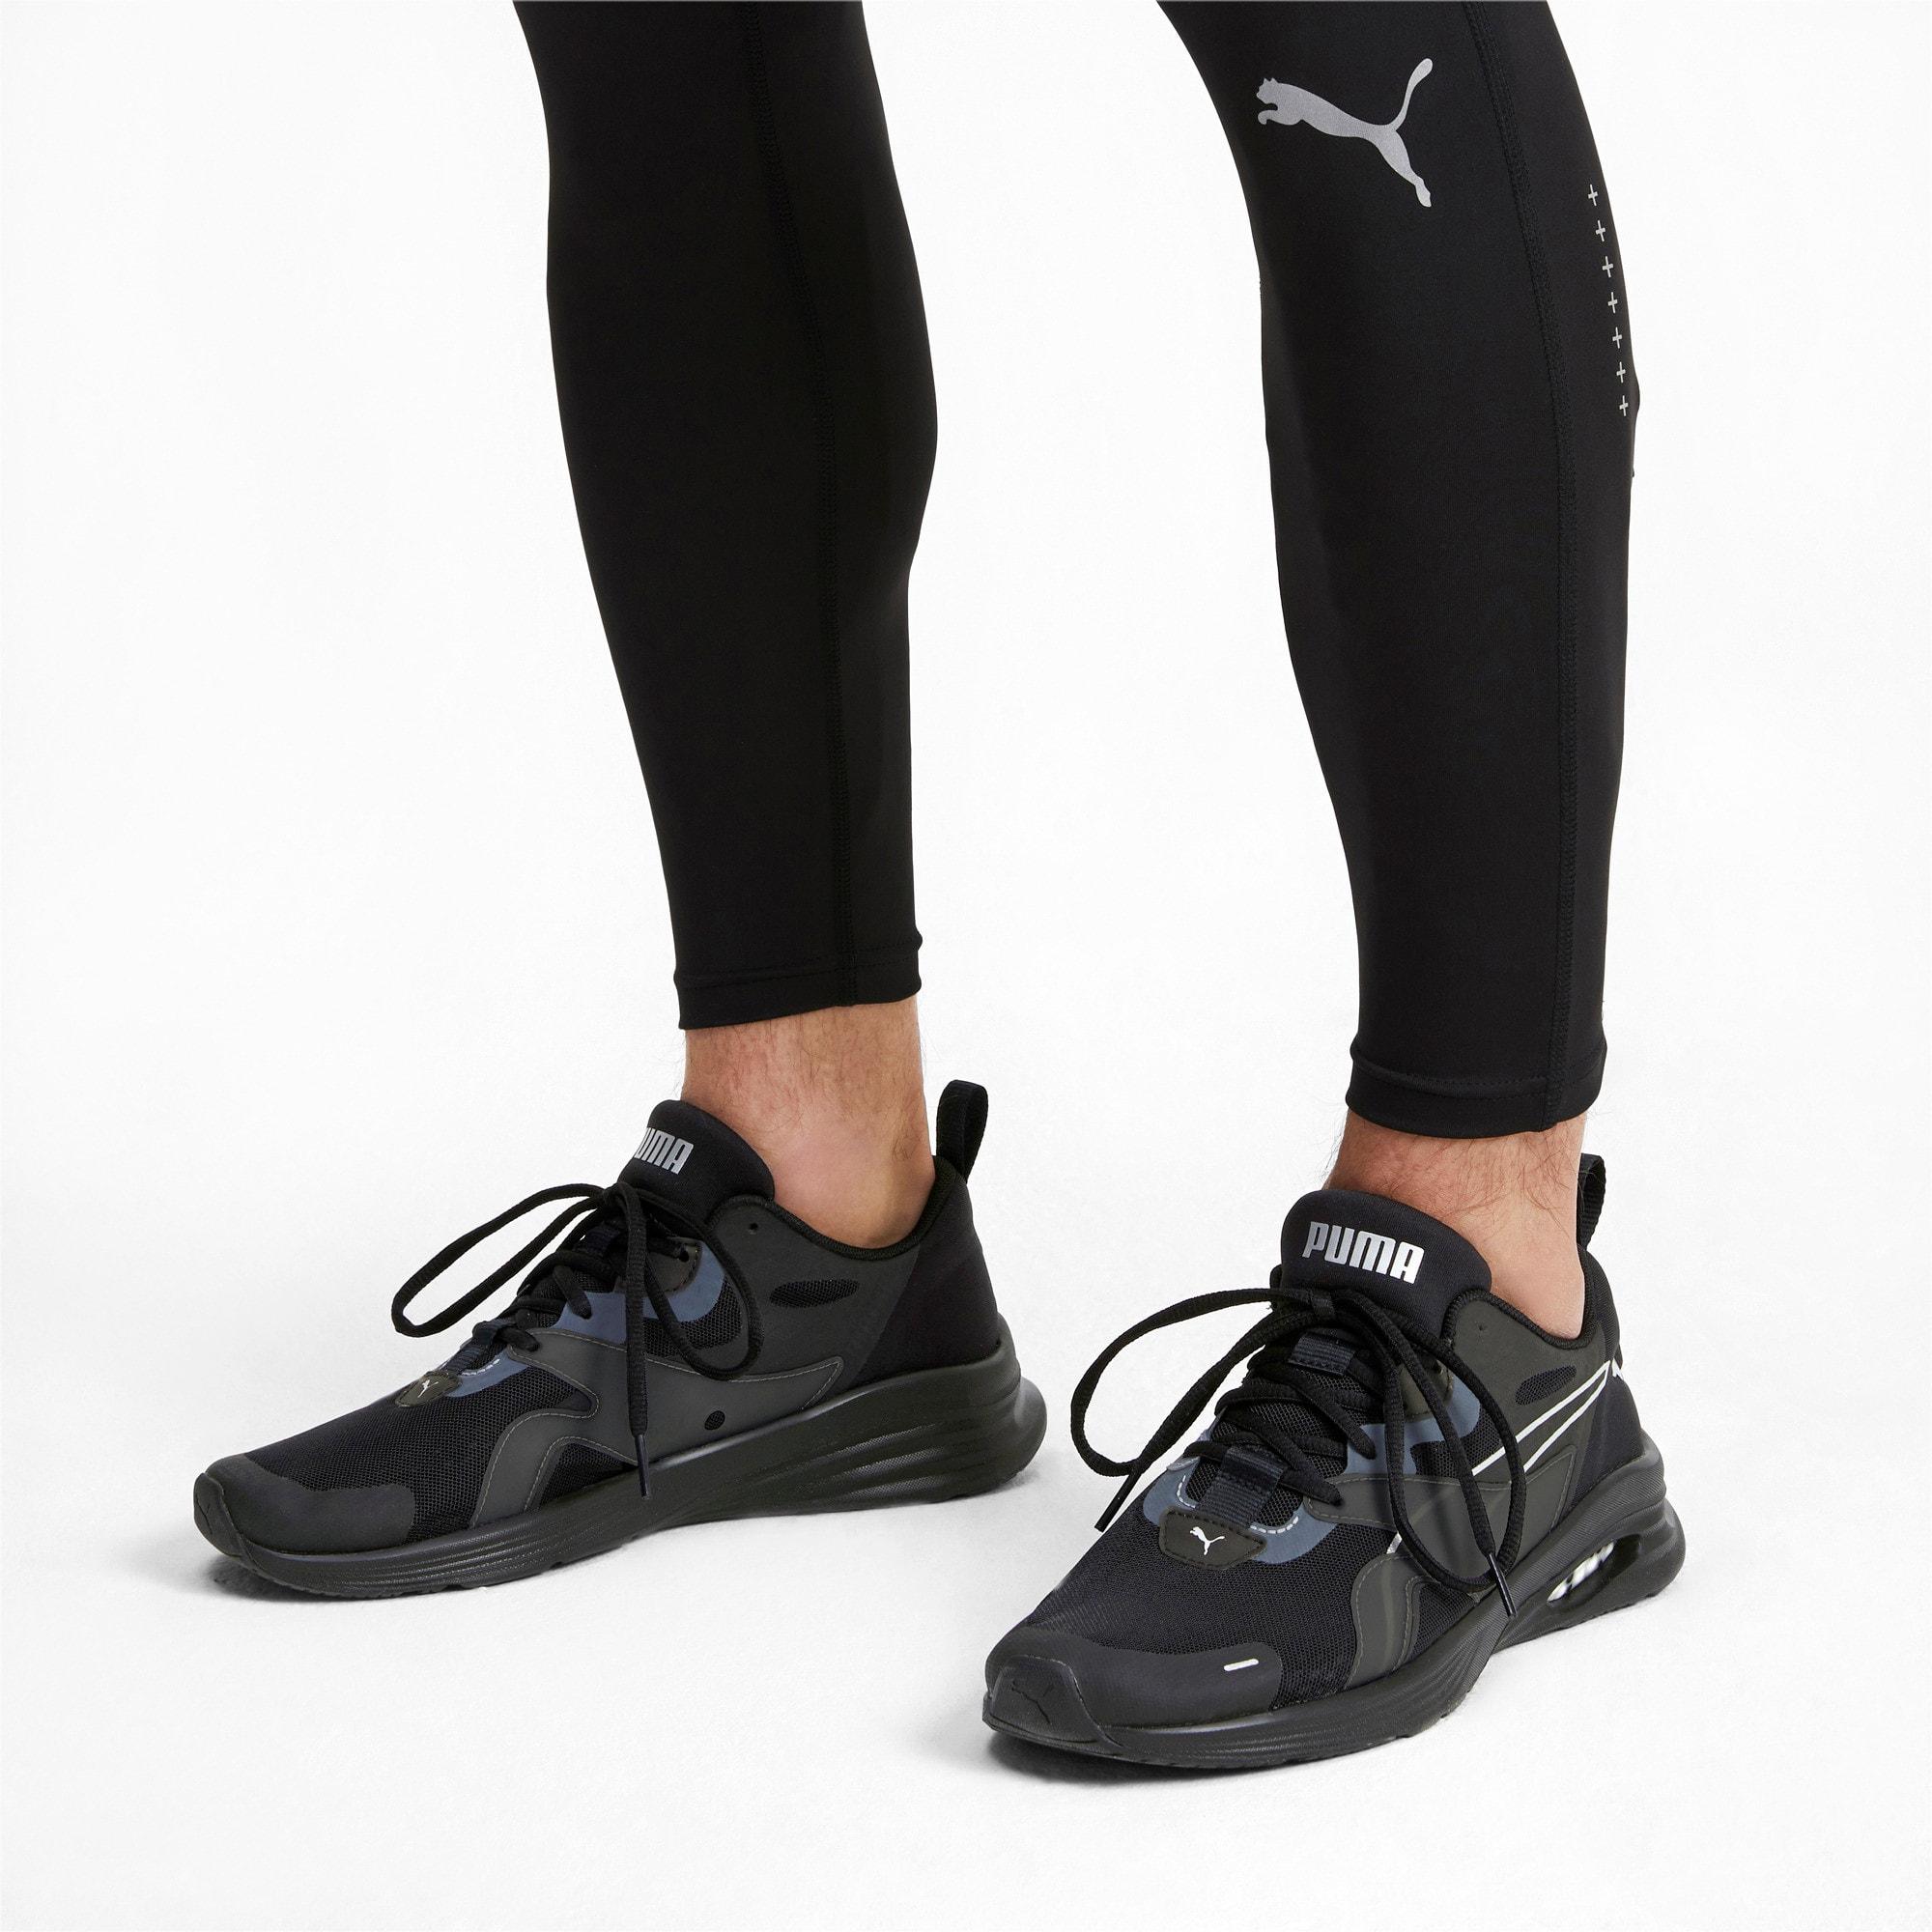 Thumbnail 2 of HYBRID Fuego Men's Running Shoes, Puma Black-Puma Black, medium